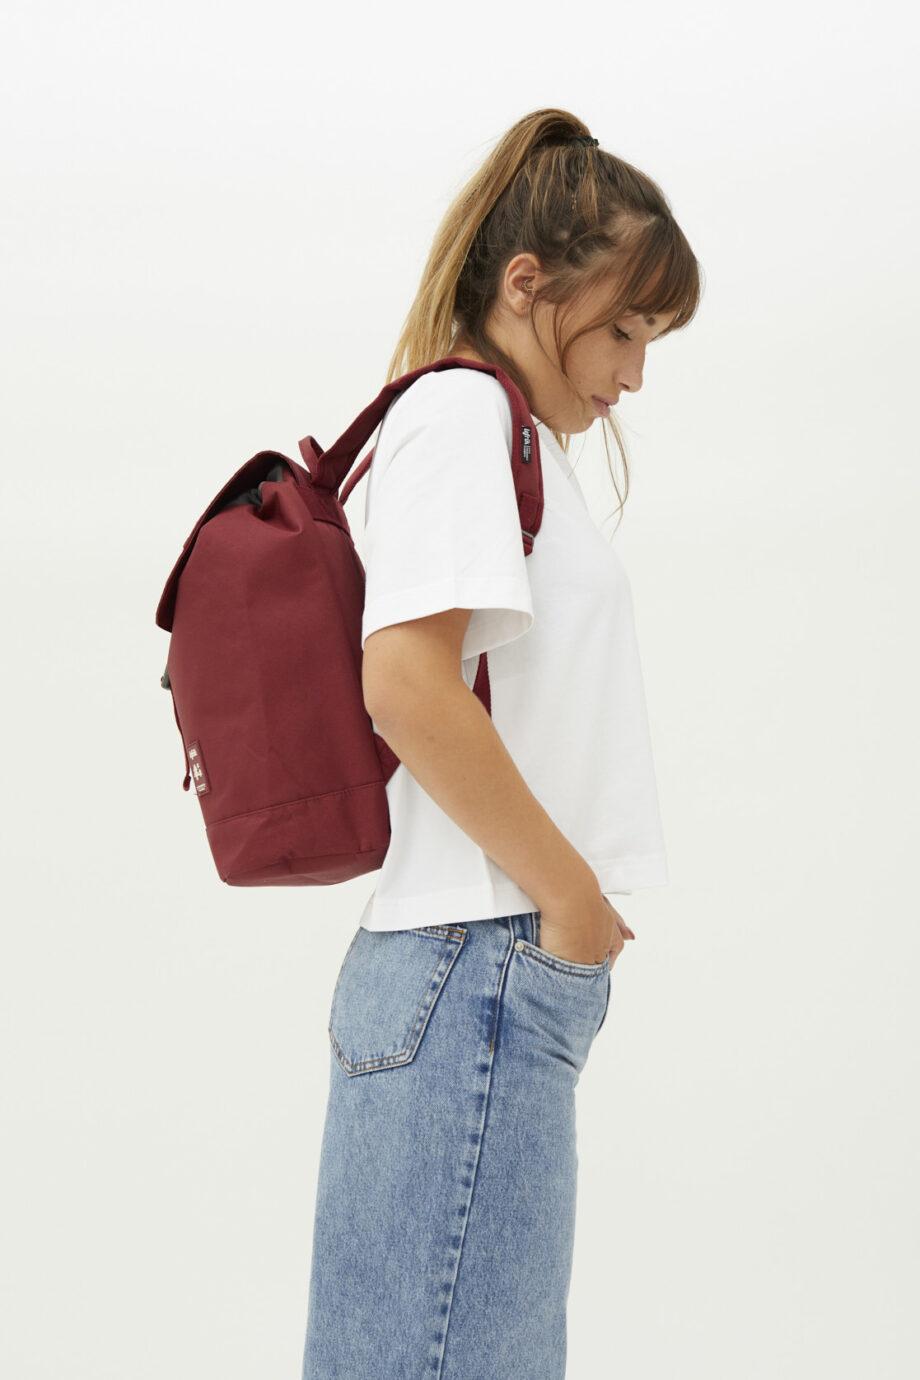 Duurzame tassen_Lefrik_Scout_Granate_model zij